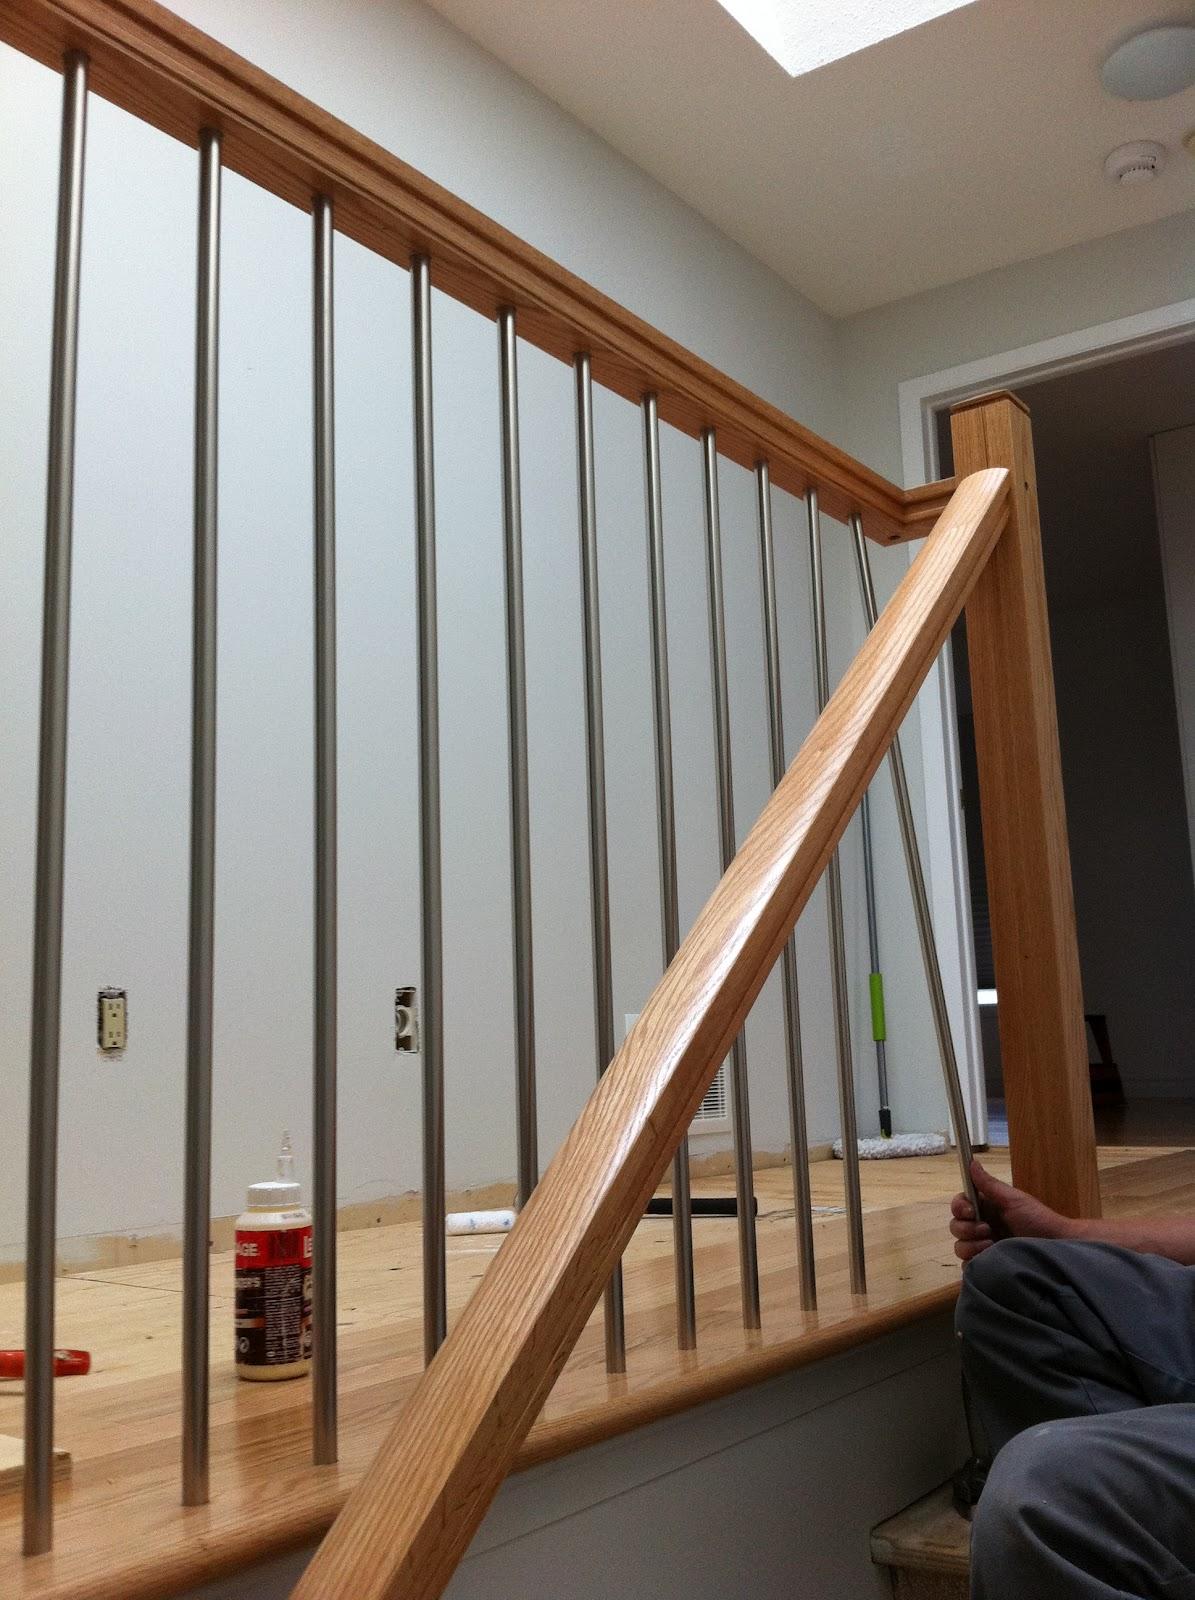 Ballet Dancers Handrail Covid Outbreak | Brushed Nickel Stair Railing | Horizontal | Farmhouse | Matte Finish | Light Dark Wood | Hallway